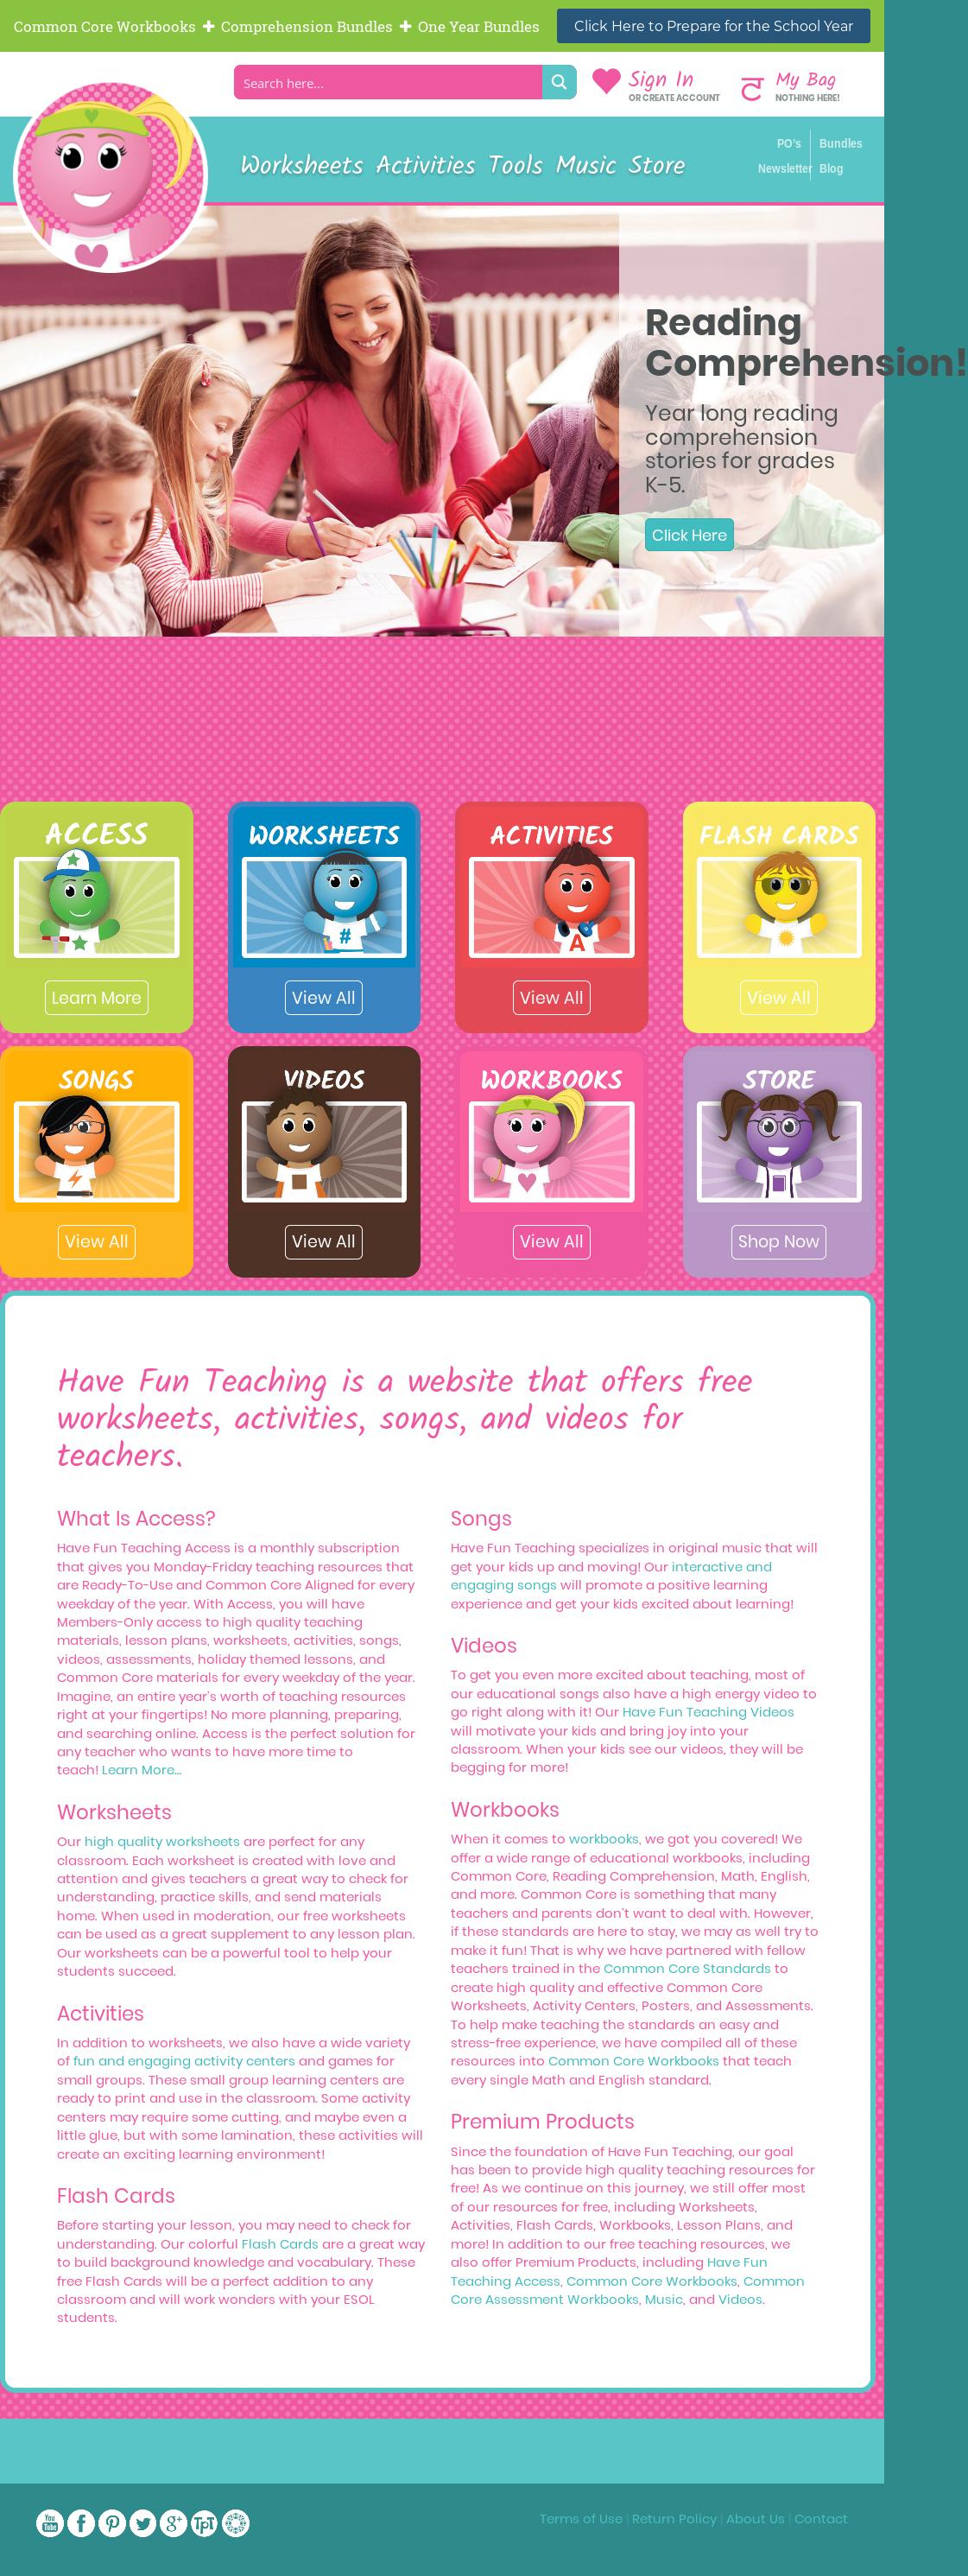 - Owler Reports - Press Release: HaveFunTeaching : Have Fun Teaching